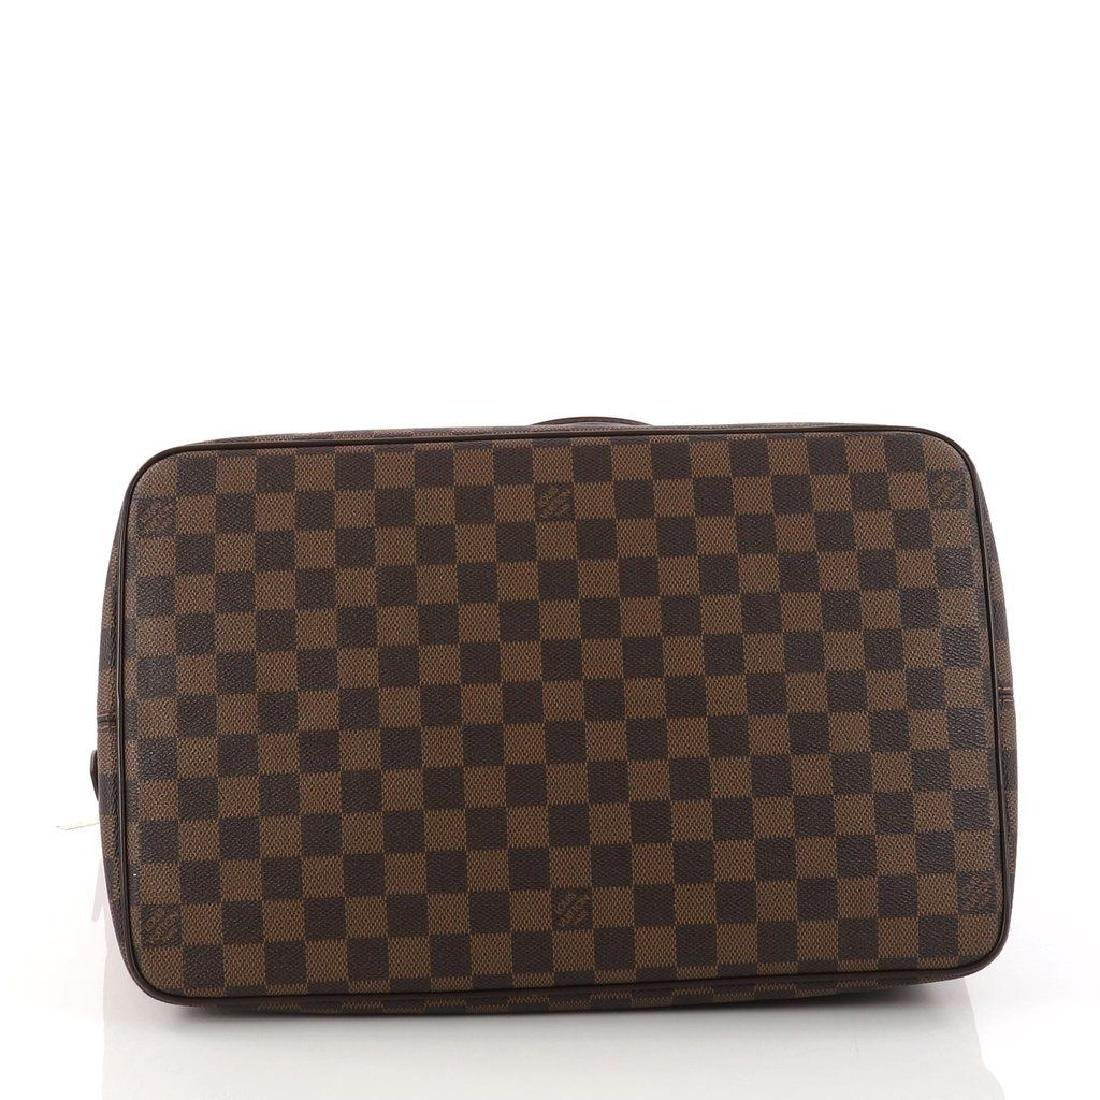 Louis Vuitton Damier Ebene Saleya GM Tote Shoulder Bag - 5